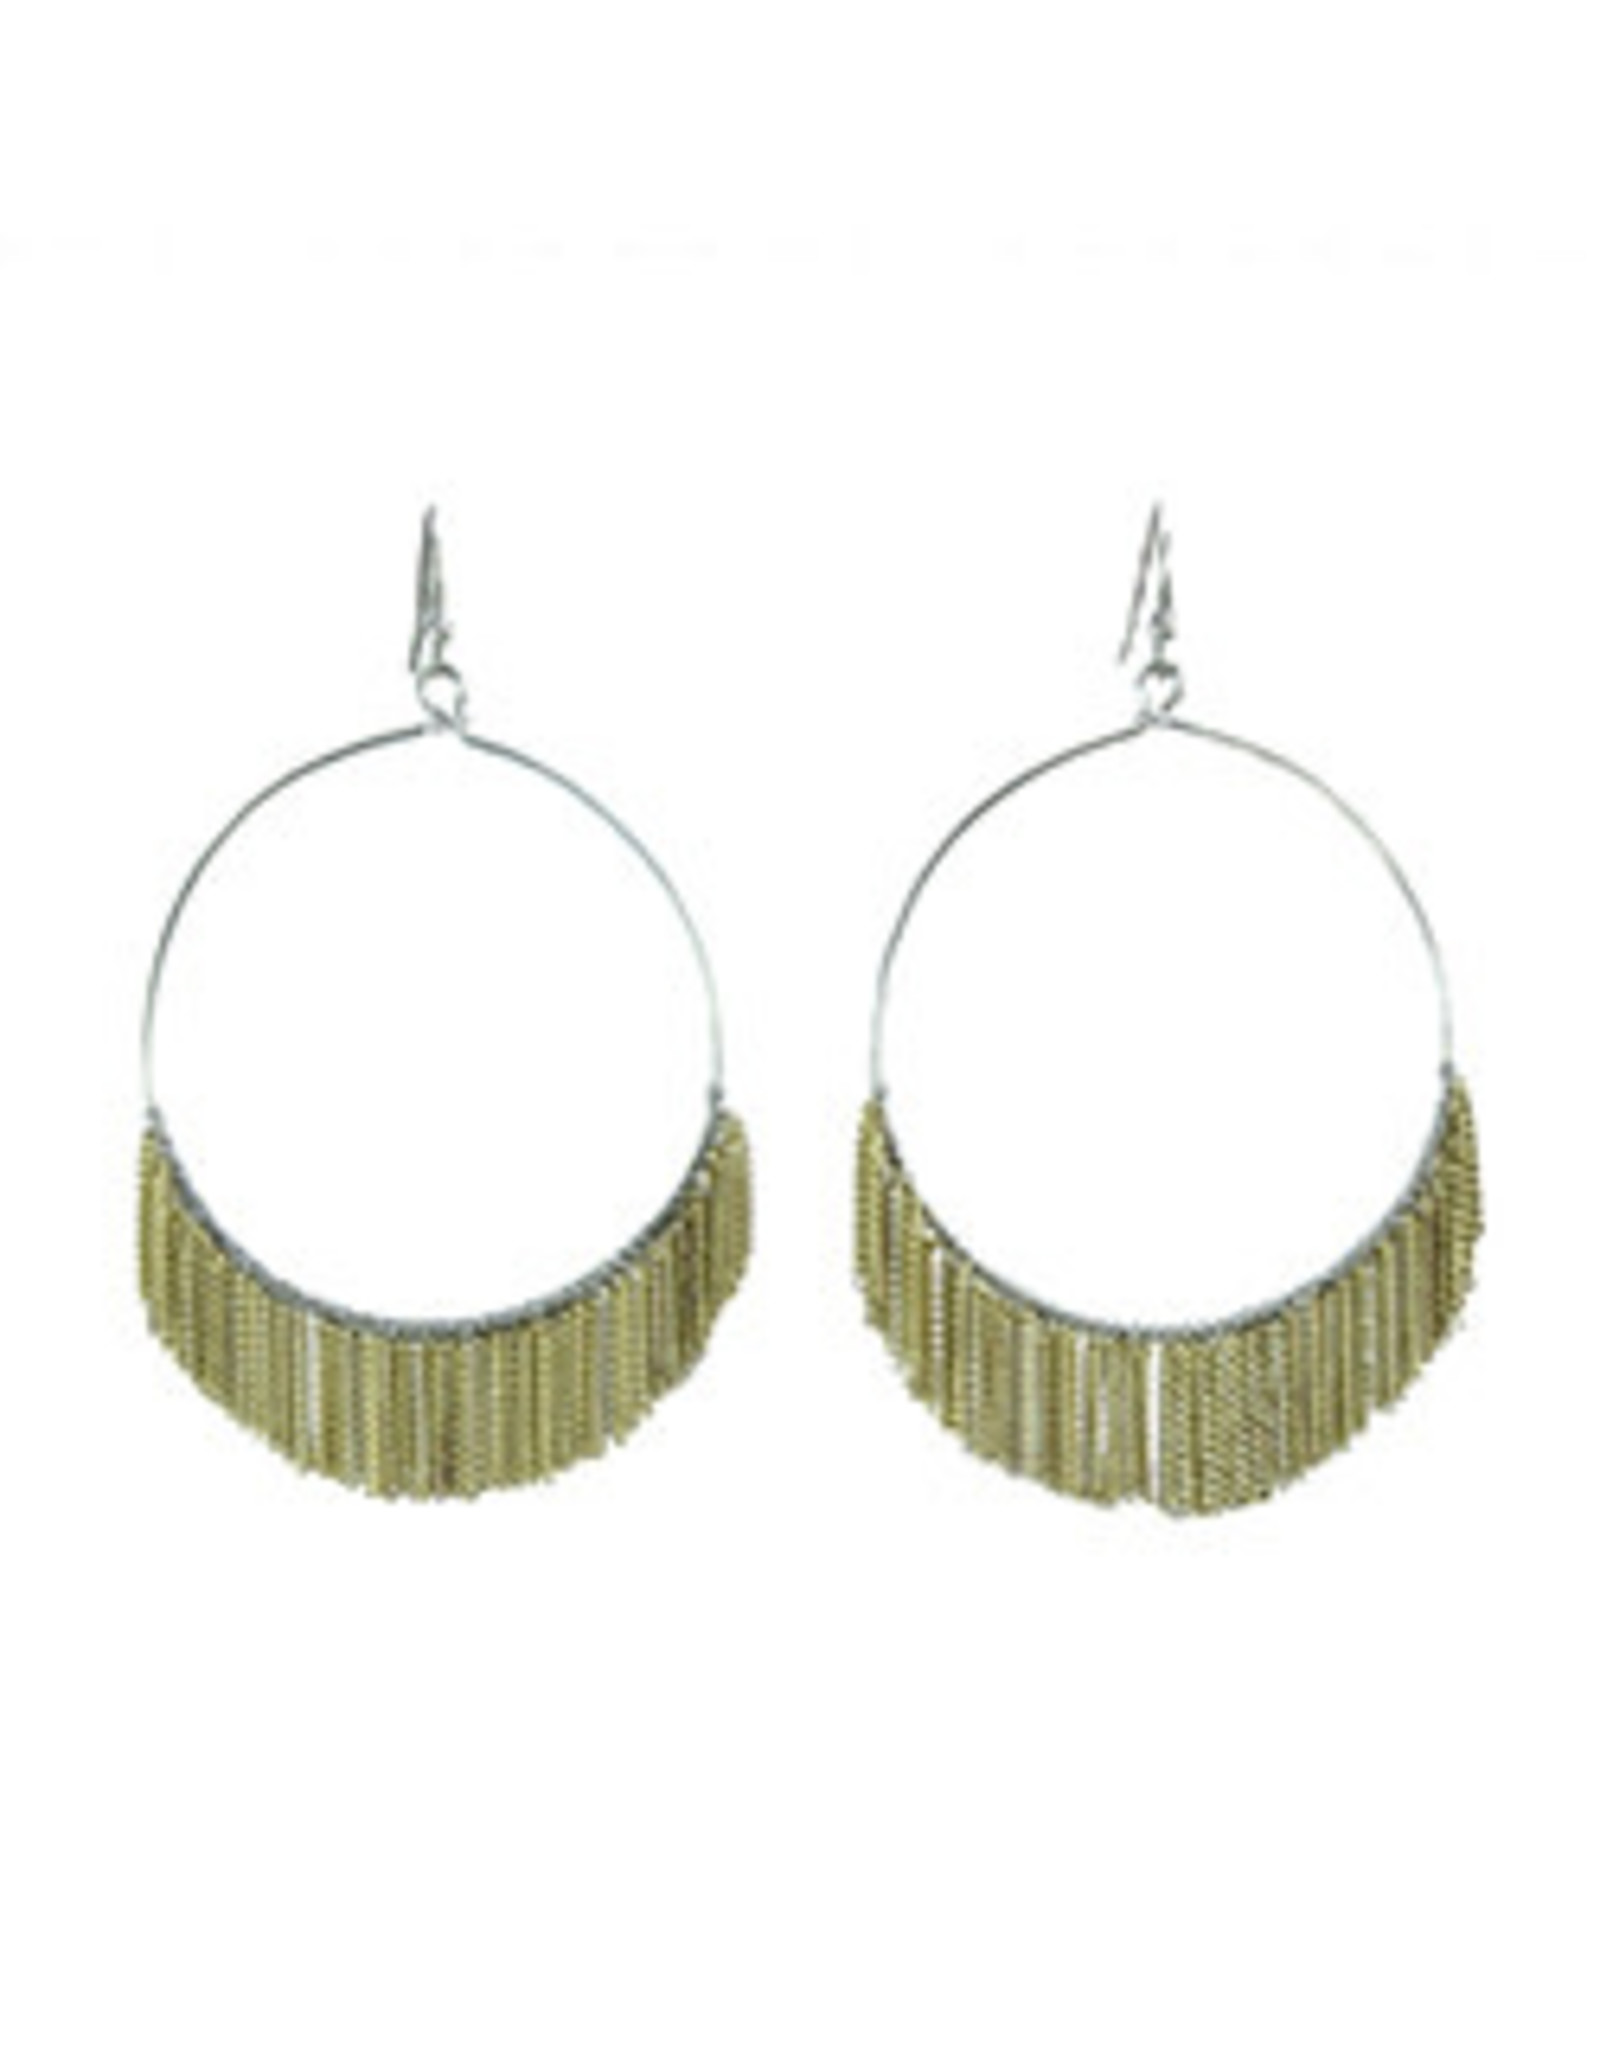 Delicate Fringed Chain Hoops  Gold Earrings